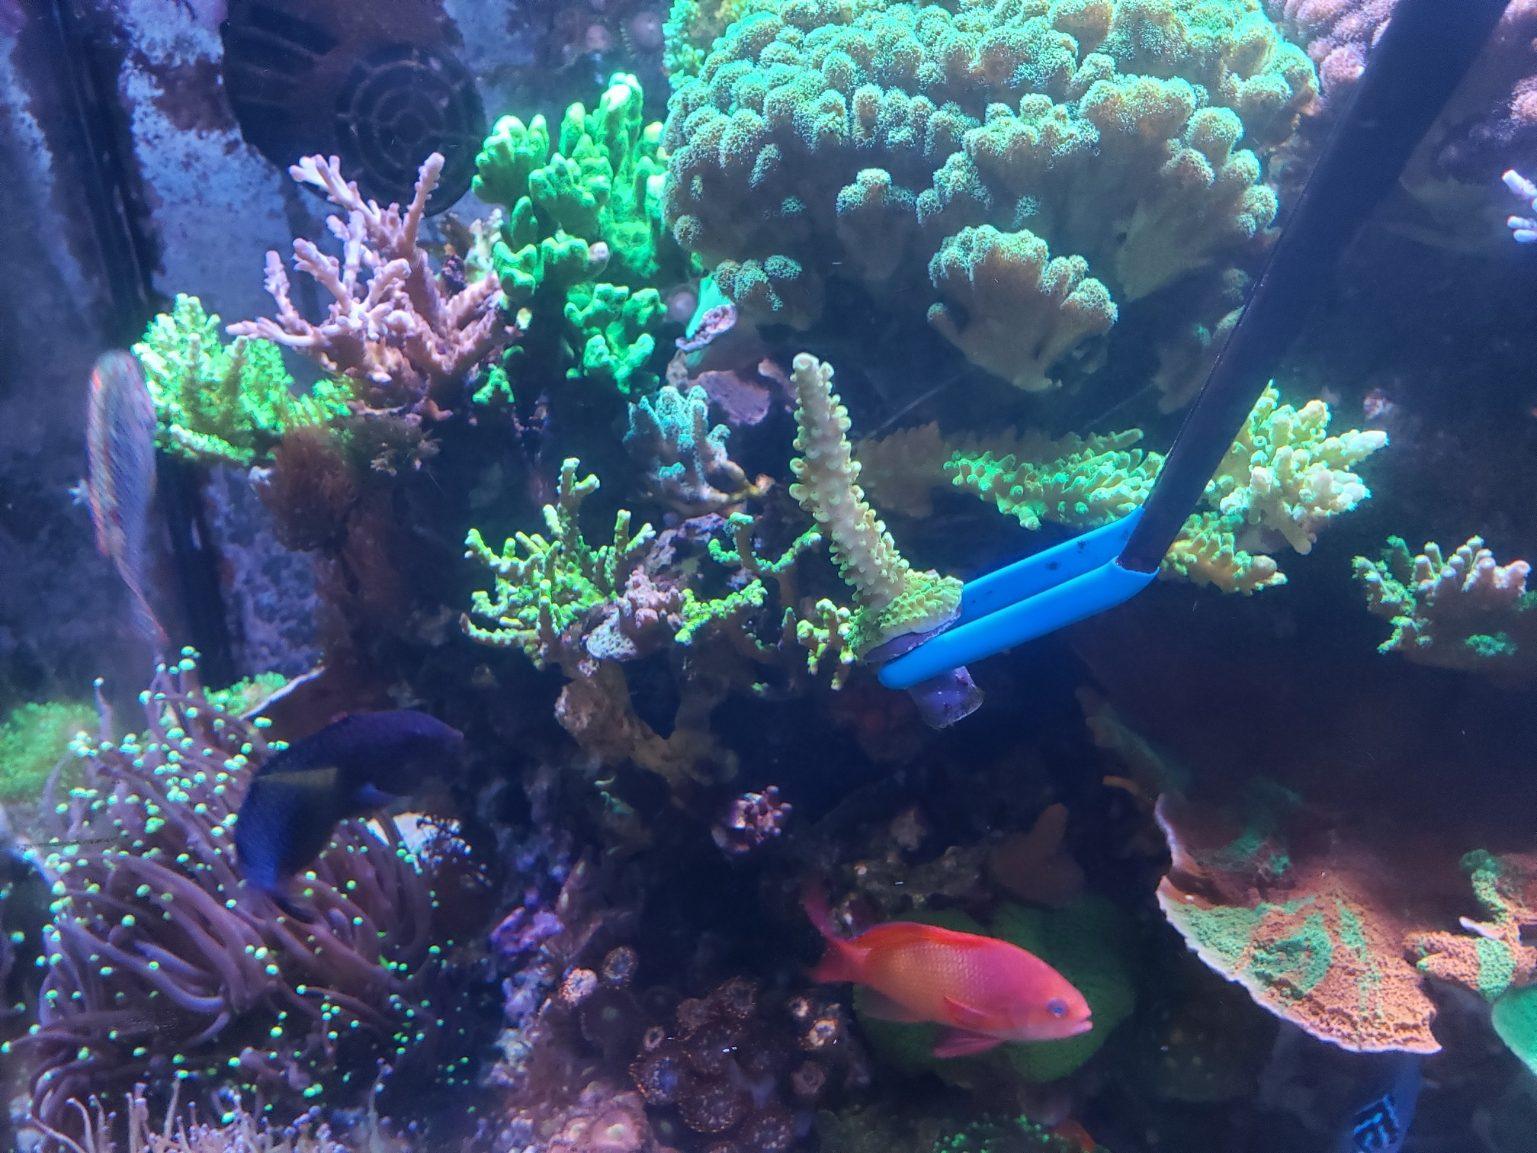 New Coral FRAG Propagation FRAGGING Set KIT Reef DIY Hard Soft Live Tools CRL-0032 PRECISE CANADA